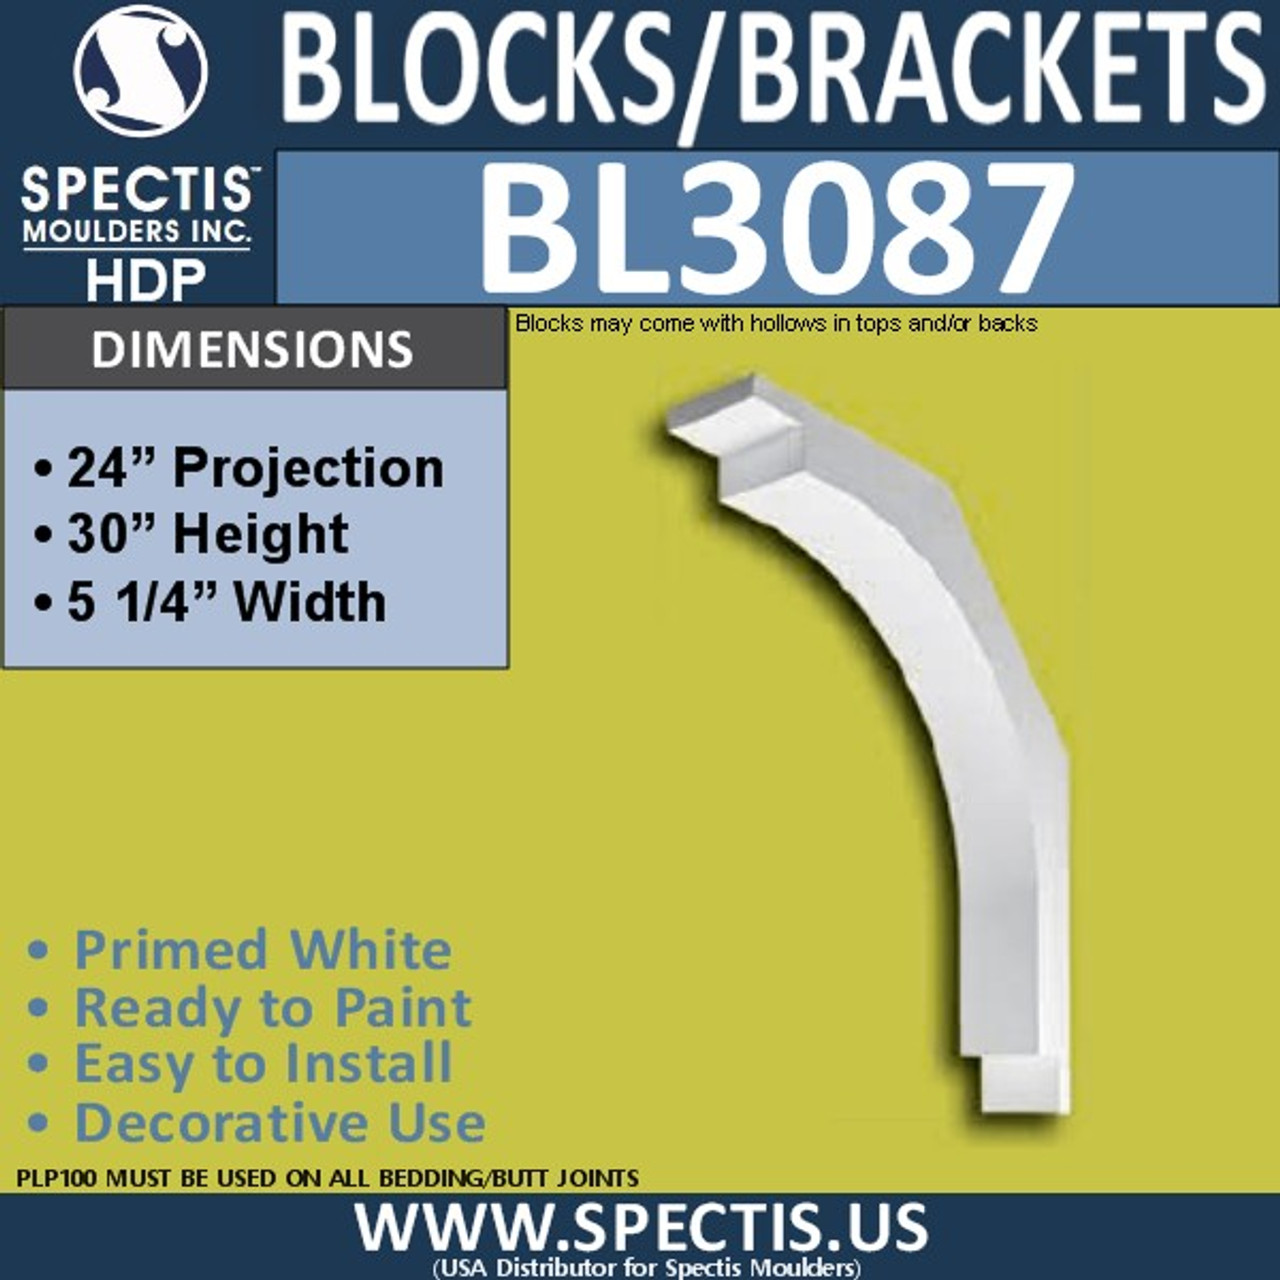 "BL3087 Eave Block or Bracket 5.25""W x 32""H x 24"" P"